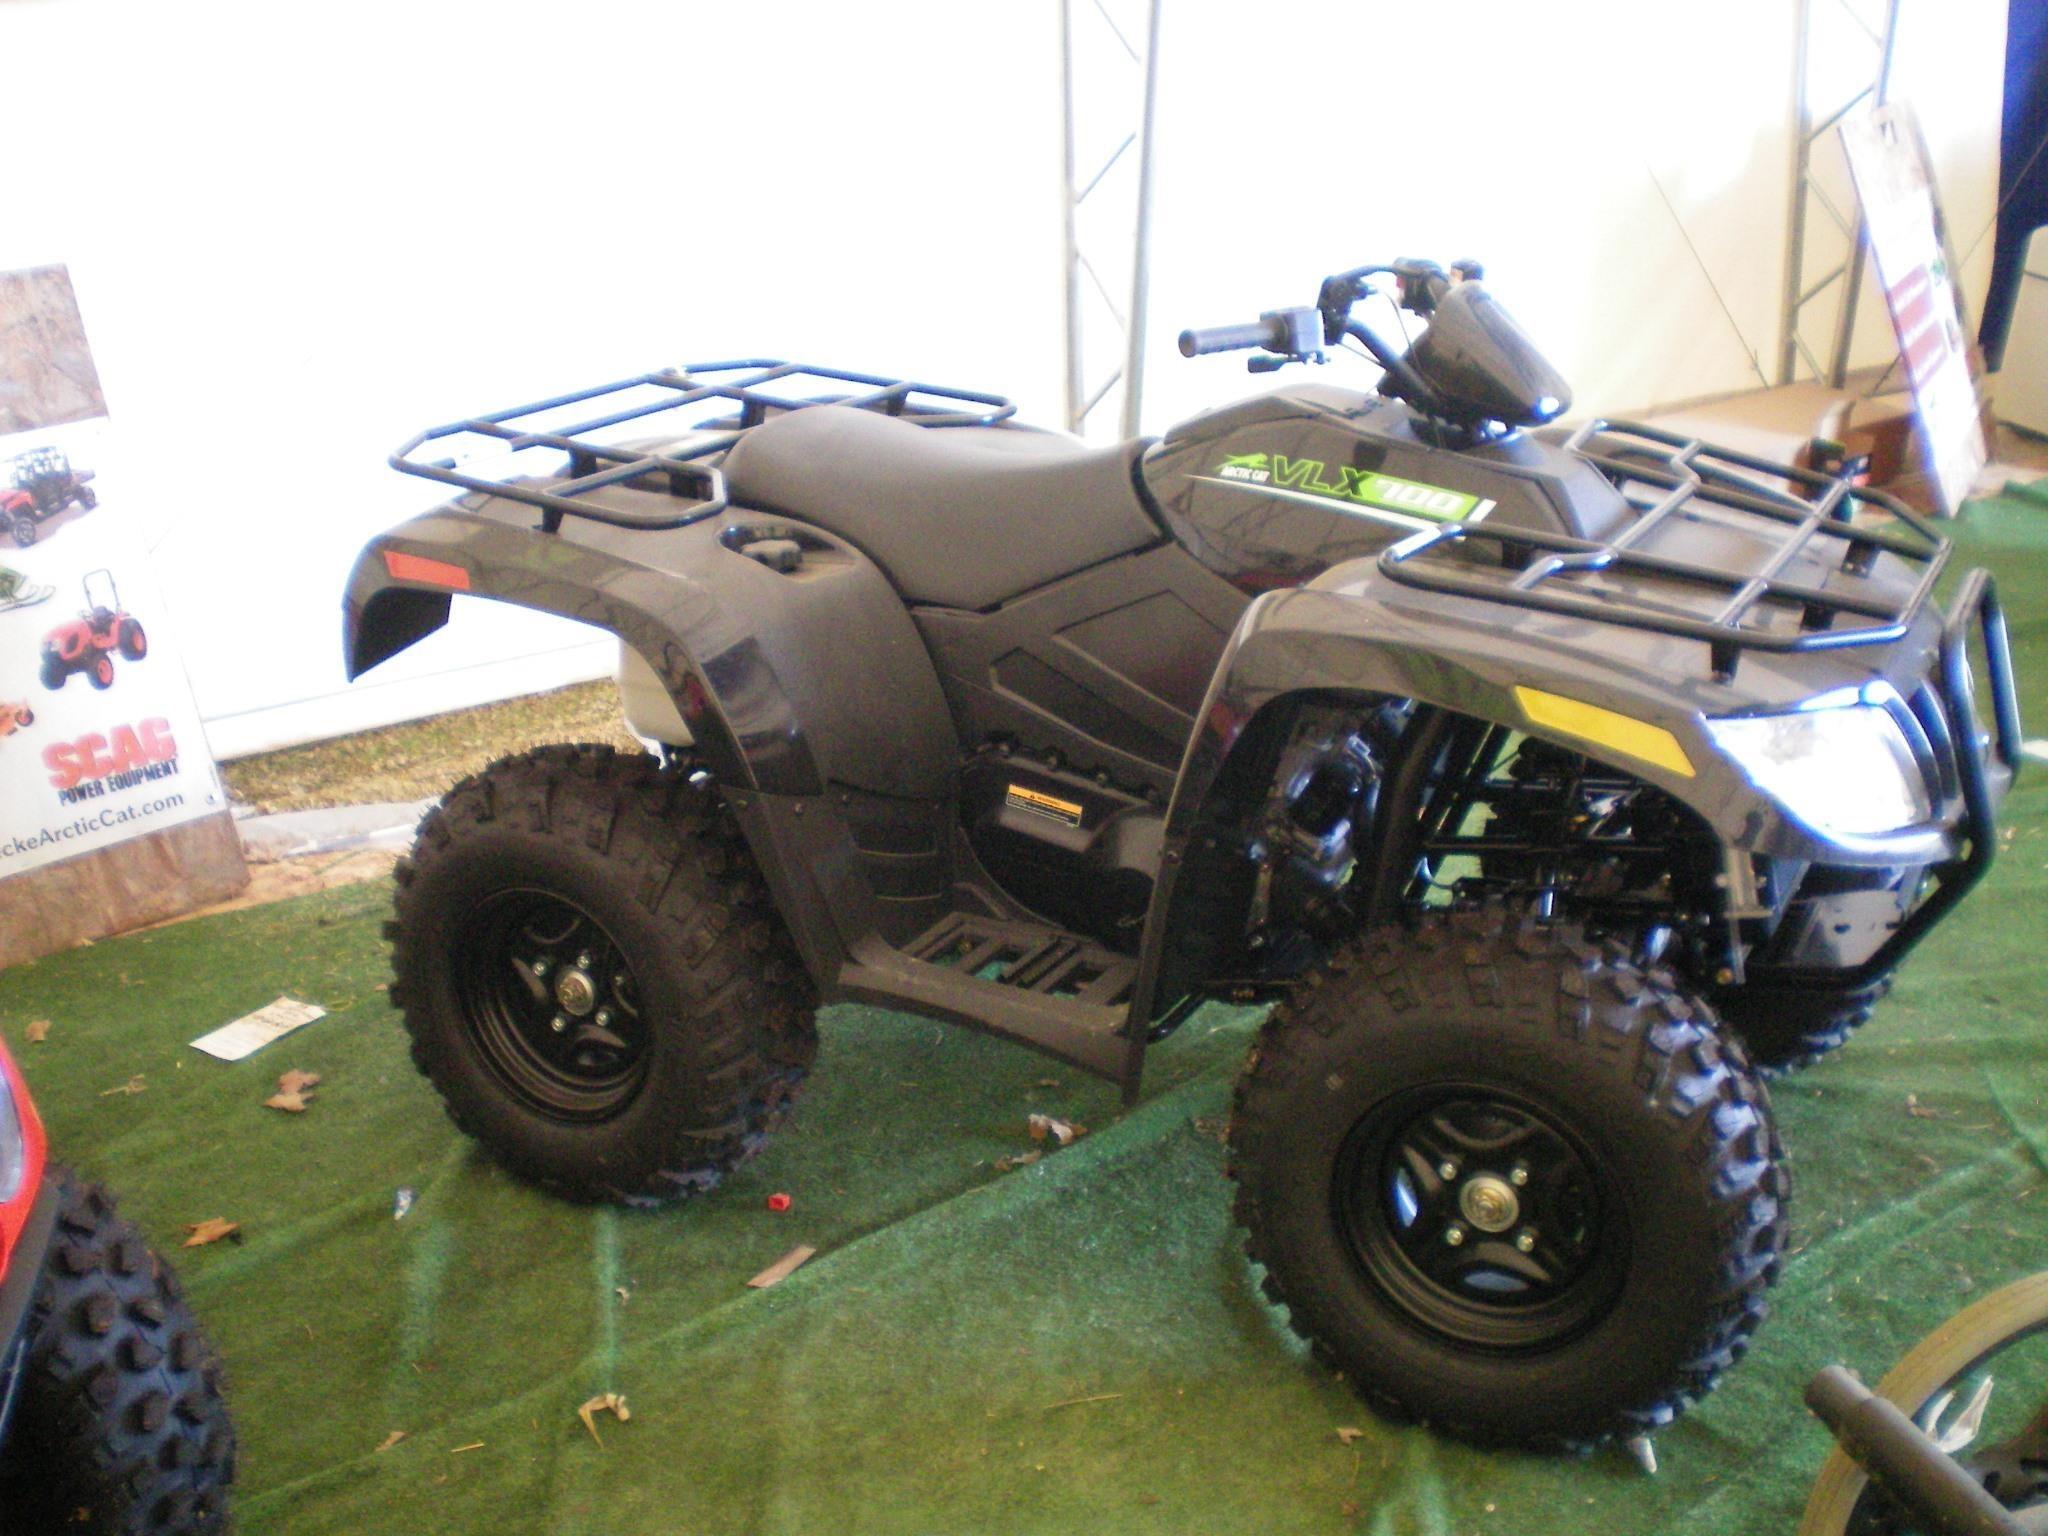 2017 Arctic Cat VLX 700 ATVs and Utility Vehicle